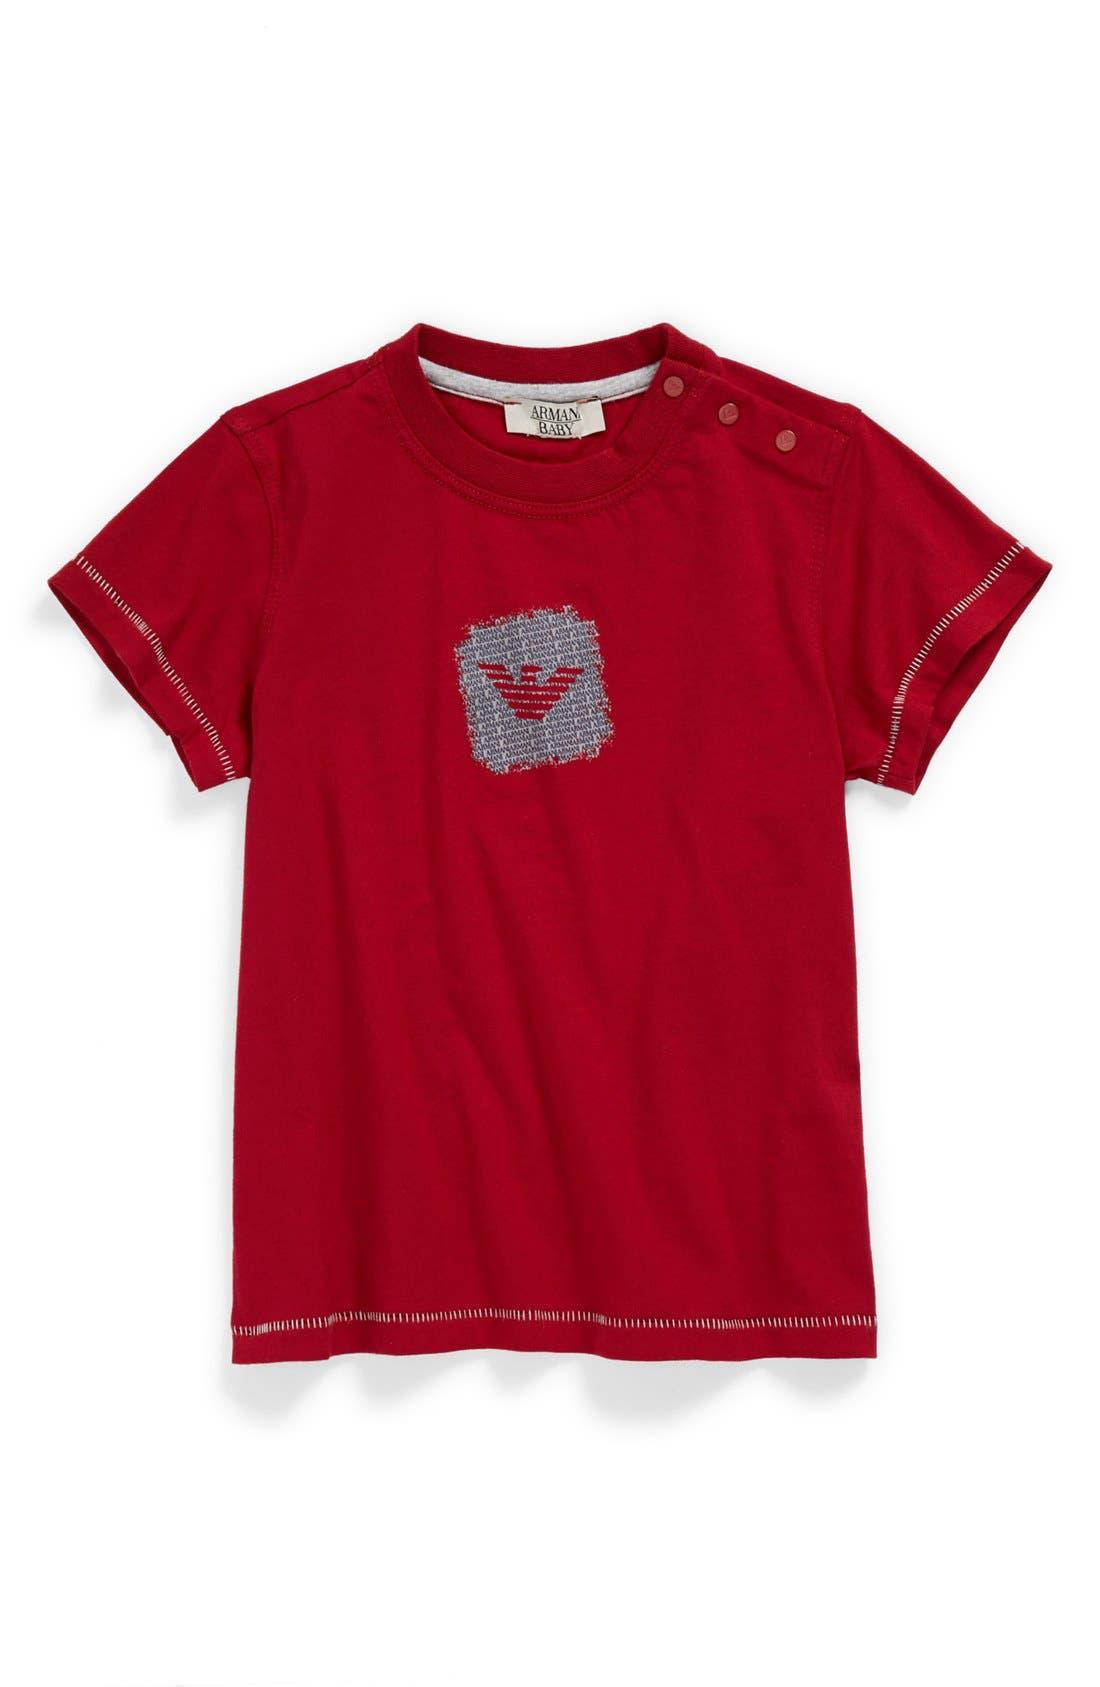 Alternate Image 1 Selected - Armani Junior Logo T-Shirt (Baby Boys)